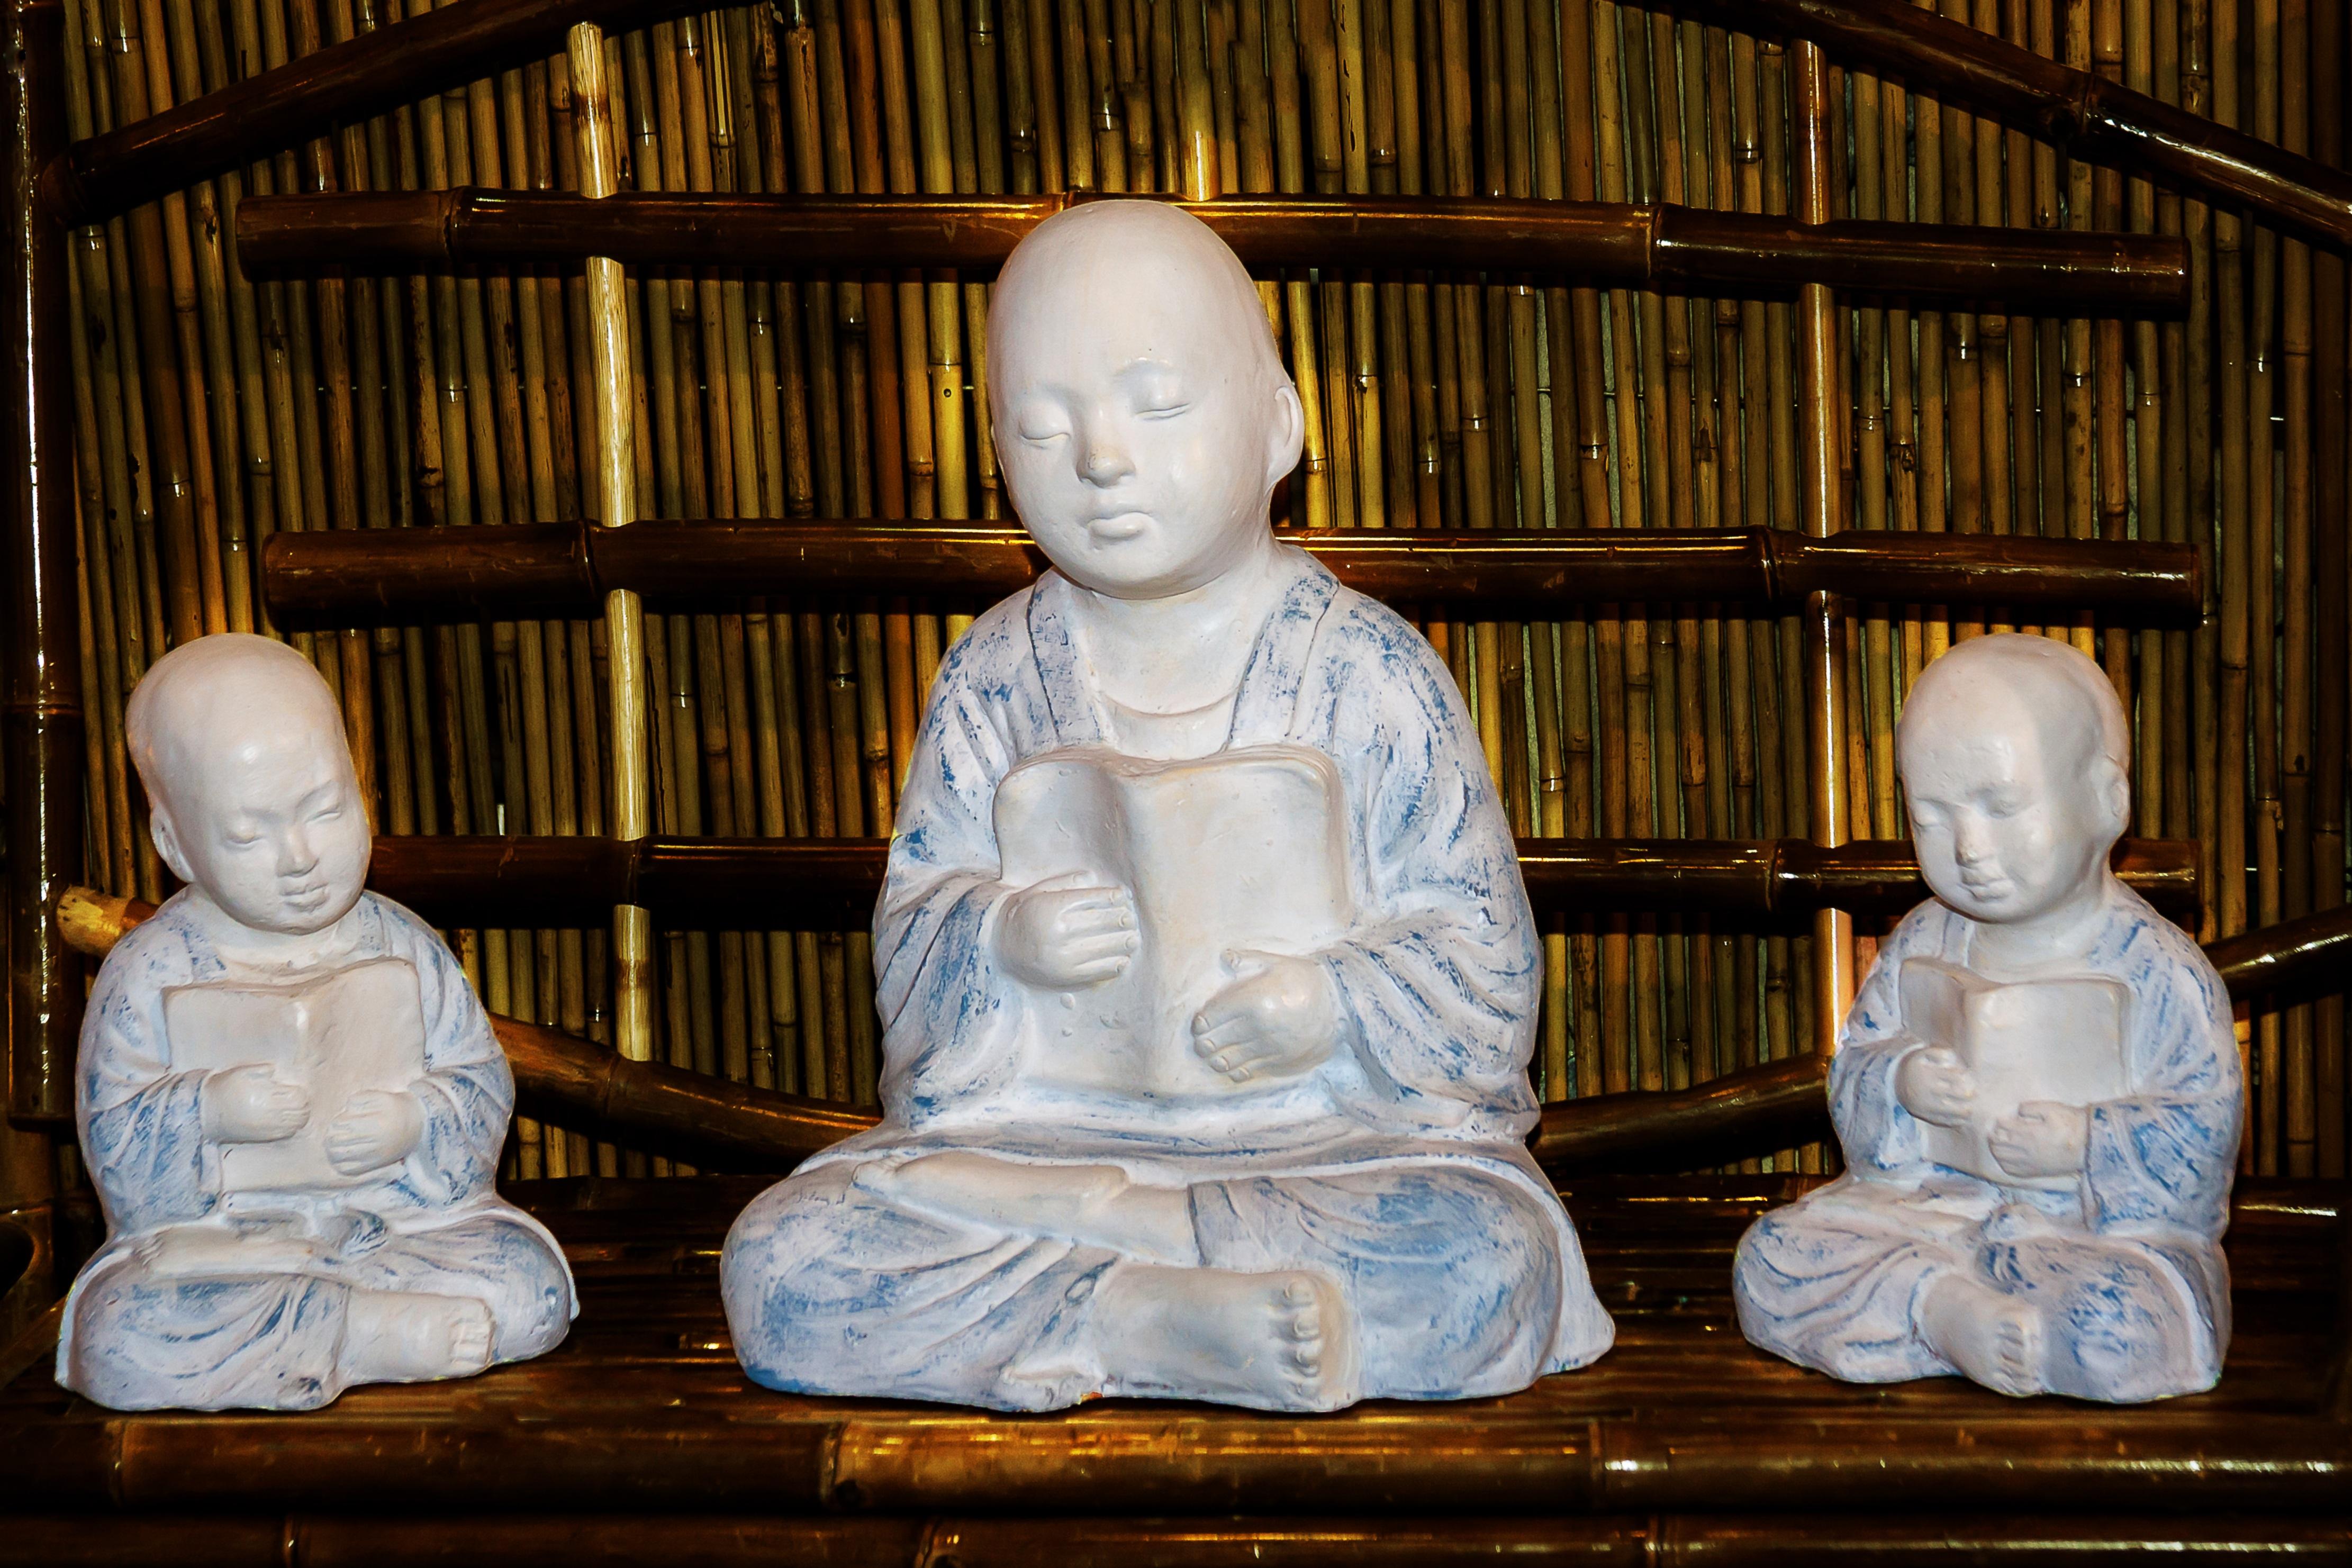 aerobic gautama buddha and aerobics Gautama buddha (c 563/480 – c 483/400 bce), also known as siddhārtha  gautama, shakyamuni buddha, or simply the buddha, after the title of buddha,  was.